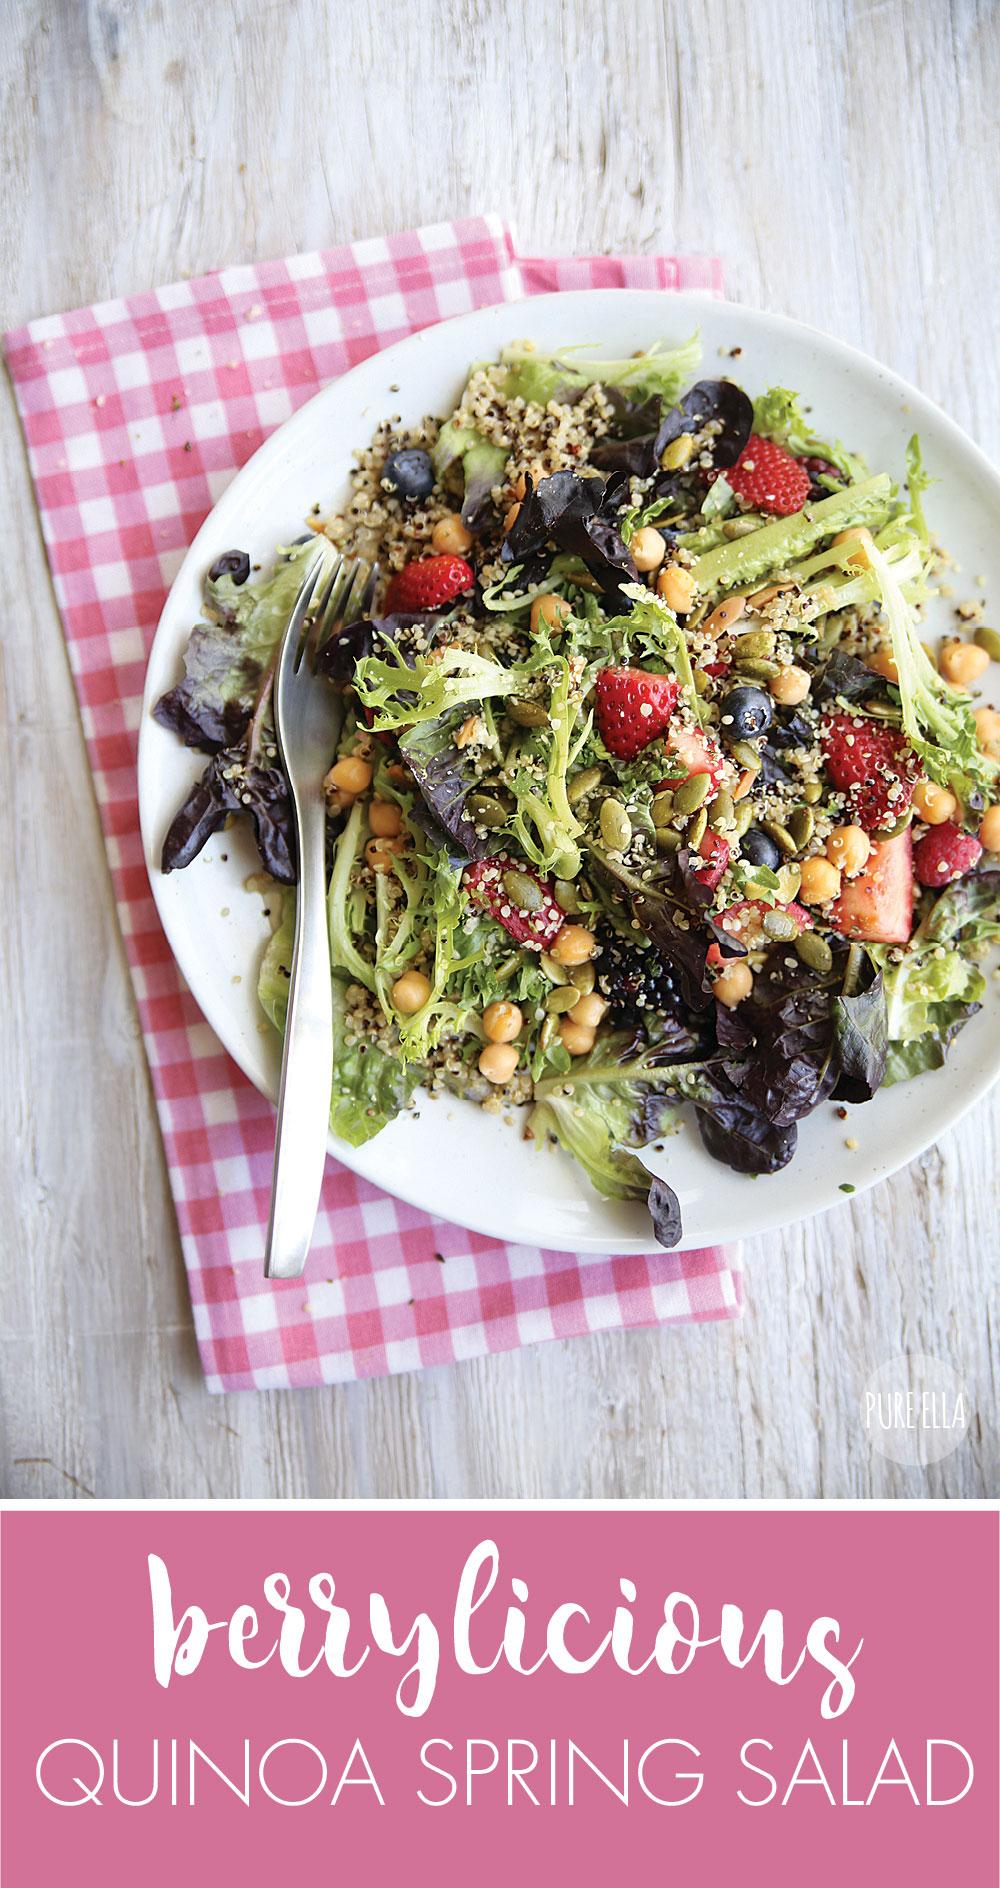 Berrylicious-Quinoa-Spring-Salad